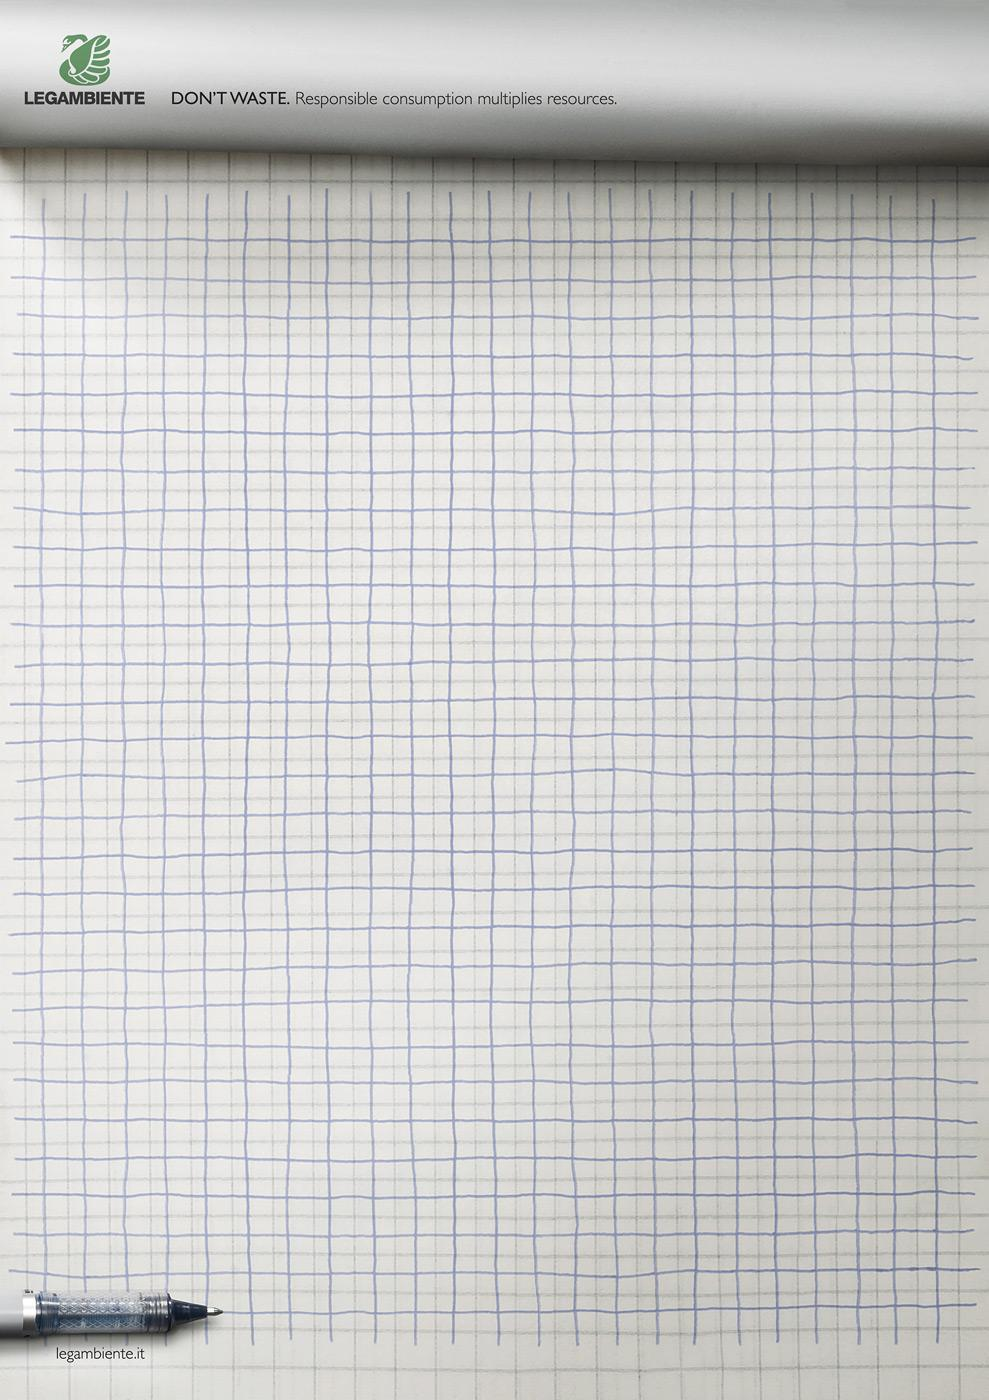 Legambiente Print Ad -  Checkered paper